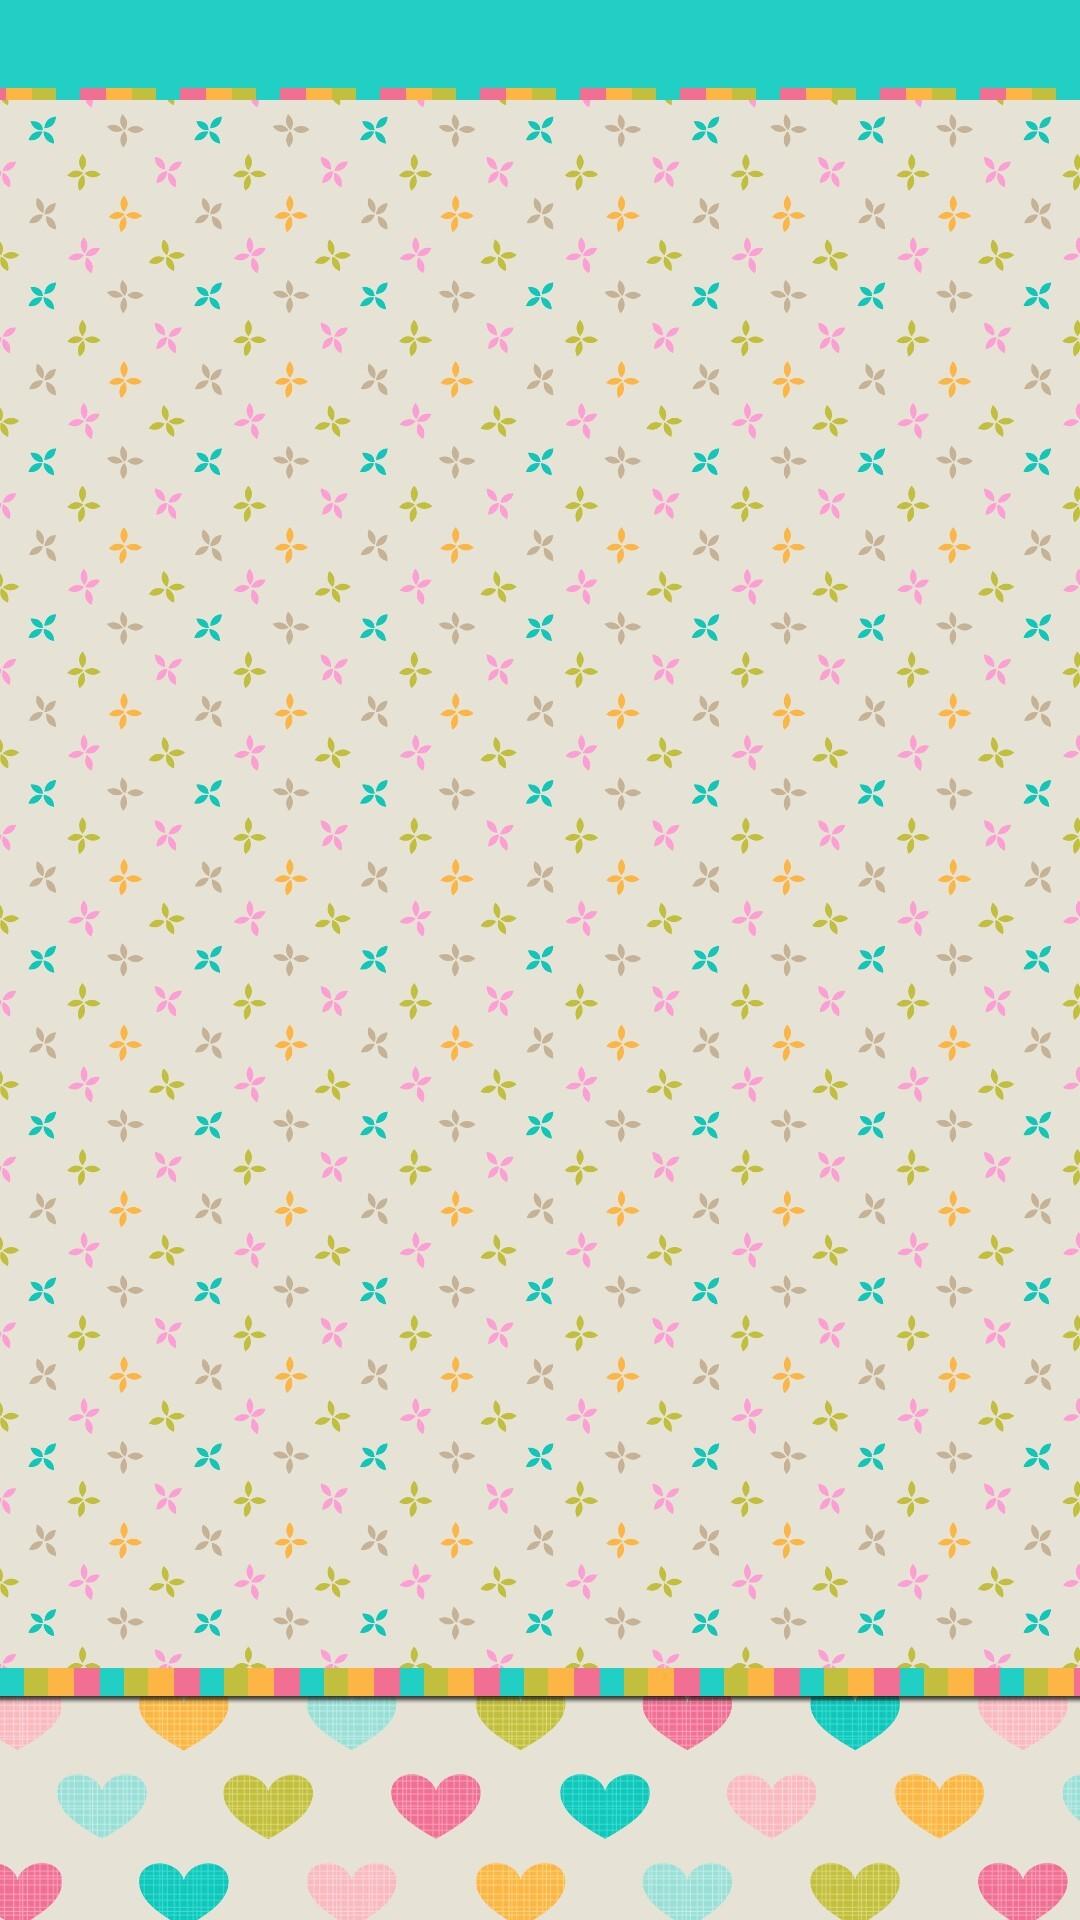 Cute Stitch Desktop Wallpaper Sfondi Carini 68 Immagini